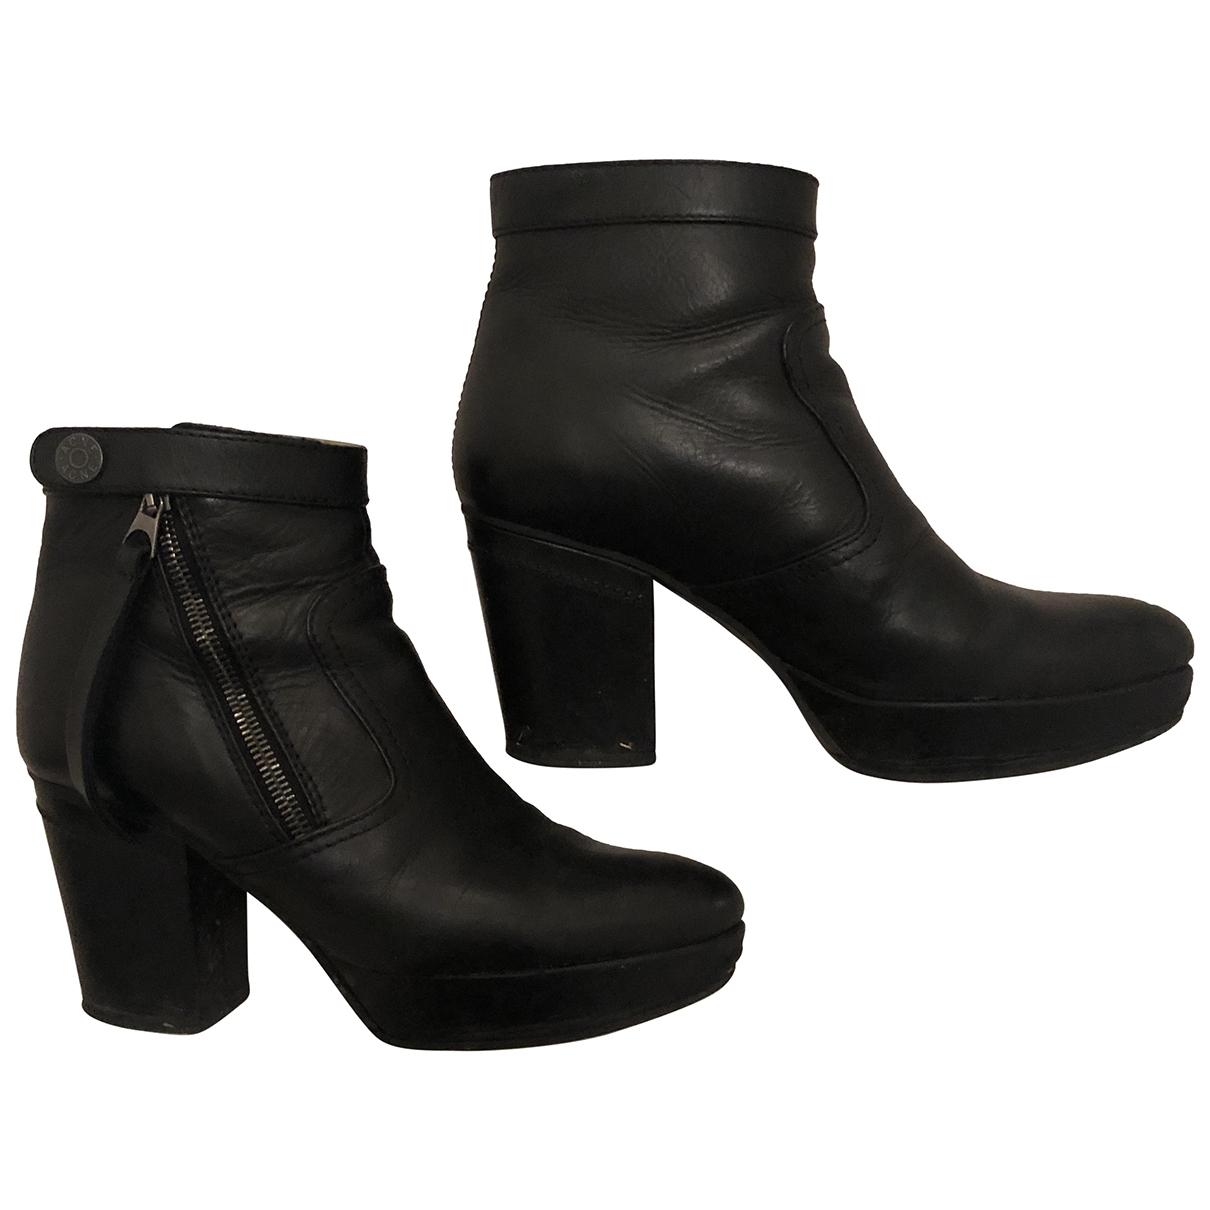 Acne Studios \N Black Leather Boots for Women 36 EU